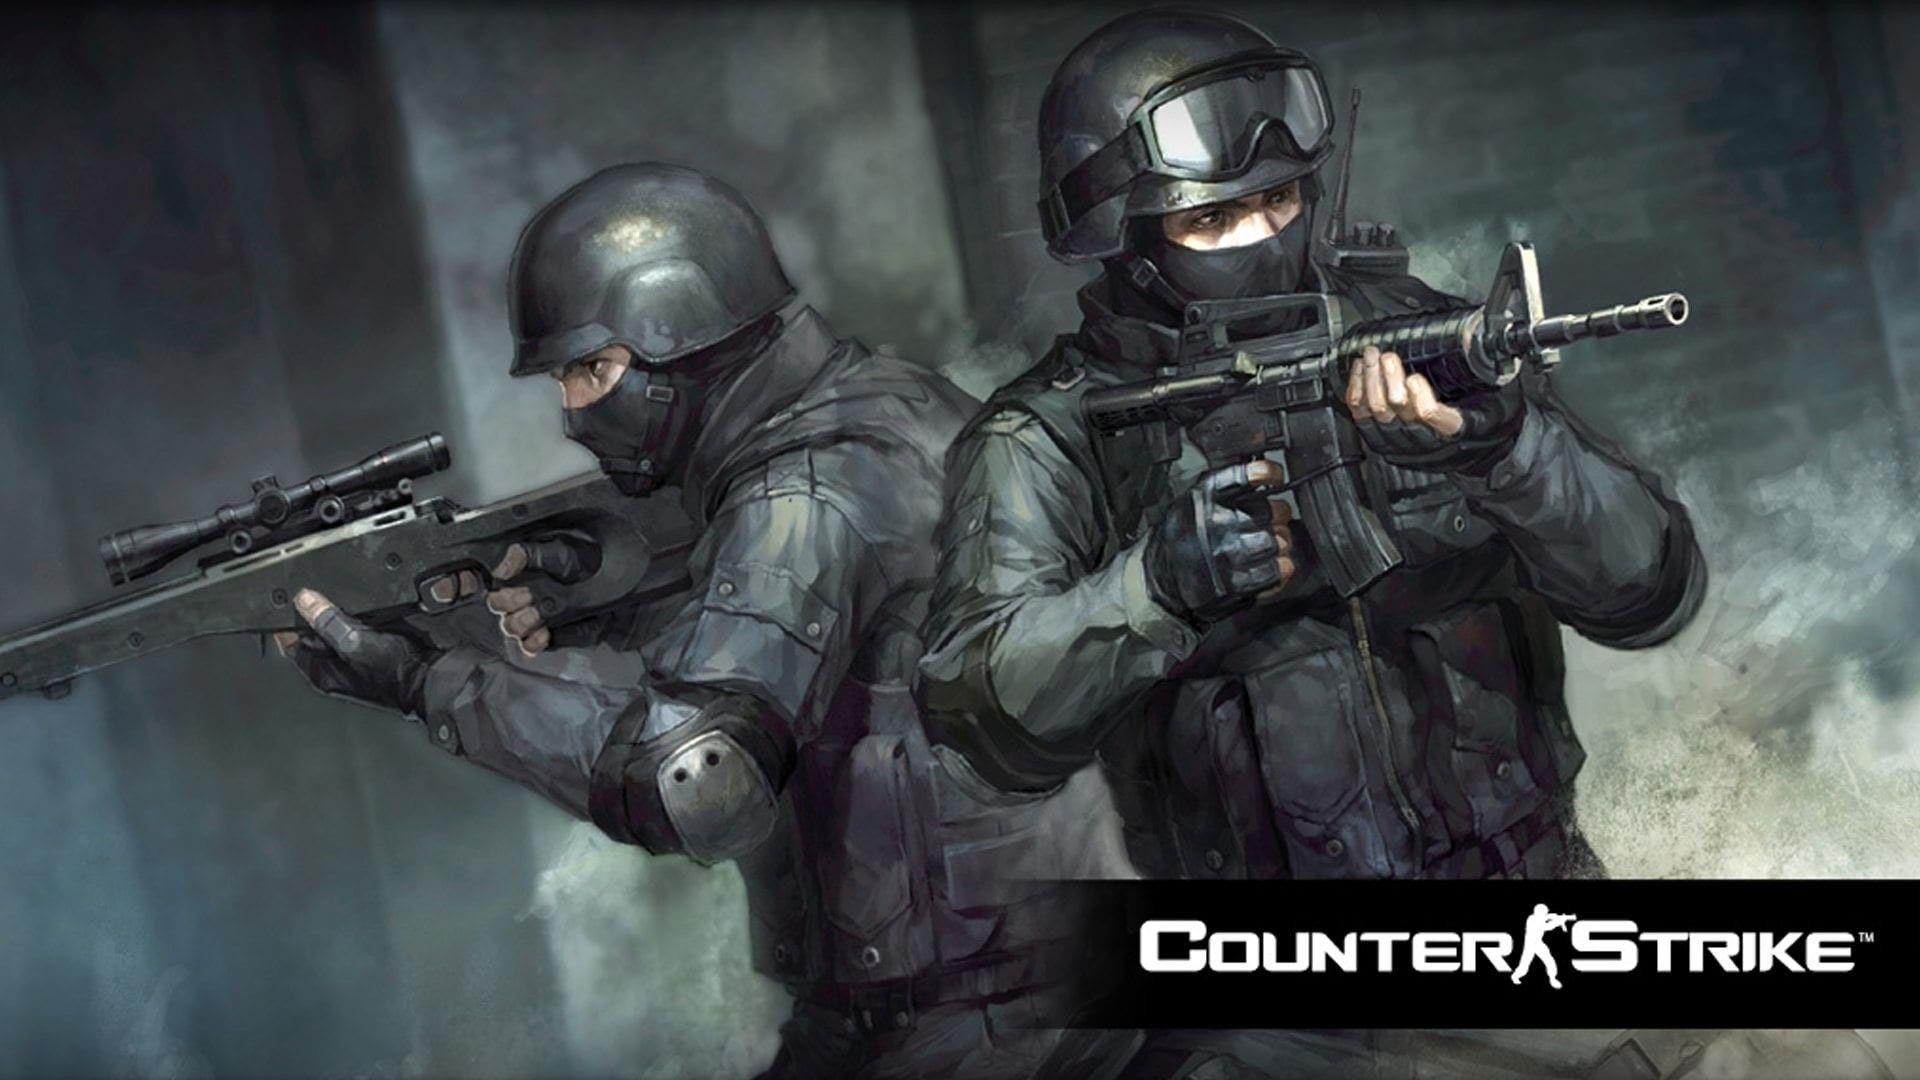 1920x1080 Counter Strike 1 6 Wallpapers Hd Android Evolucao Tecnologica Animes Manga